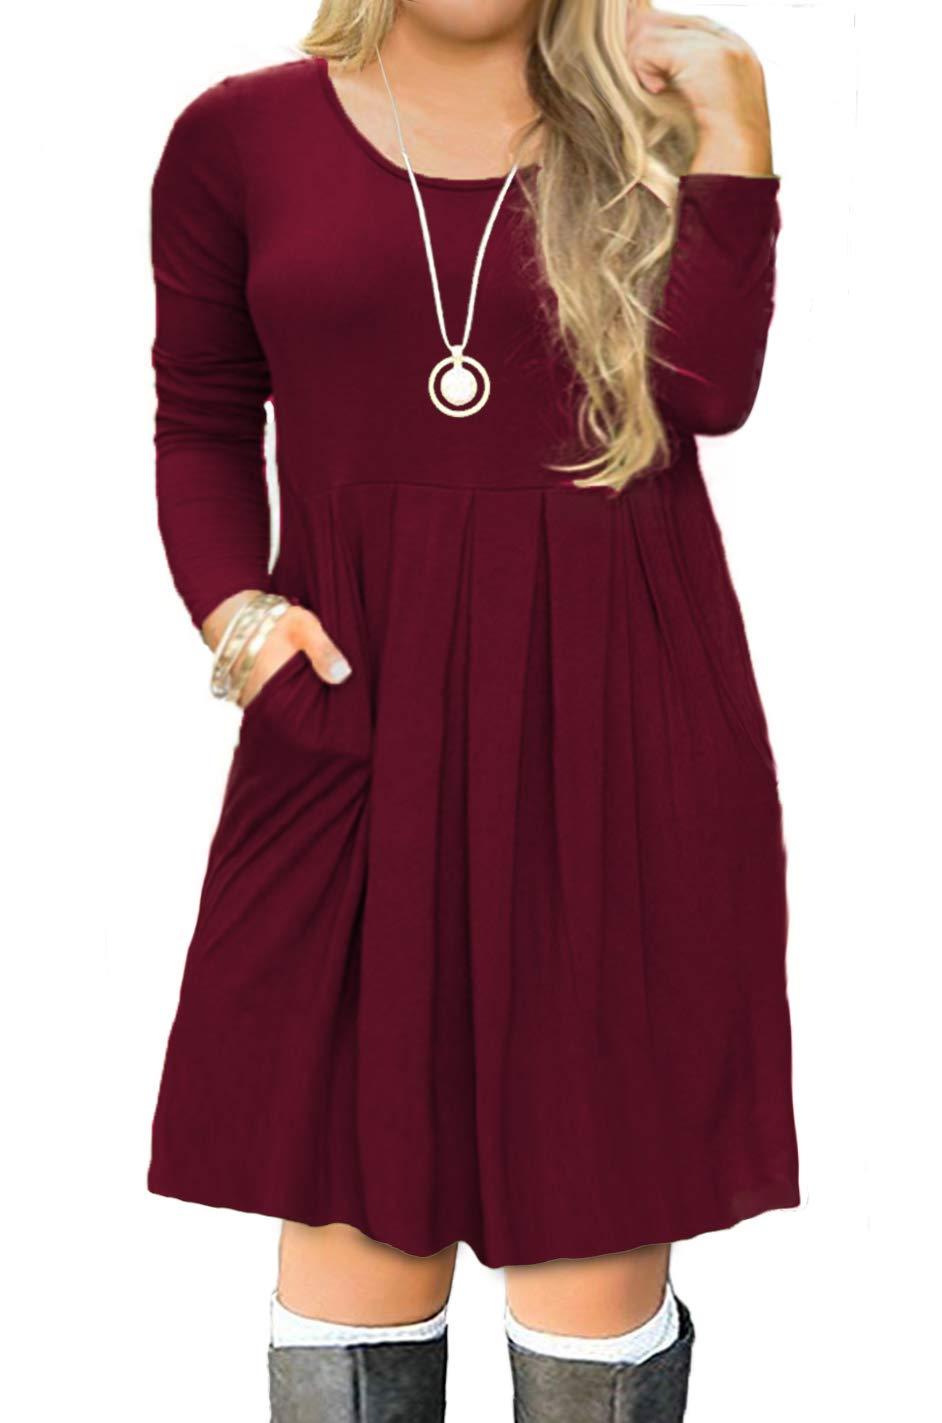 FOLUNSI Women's Plus Size Casual Long Sleeve Pleated T Shirt Dress with Pockets Wine Red 2XL by FOLUNSI